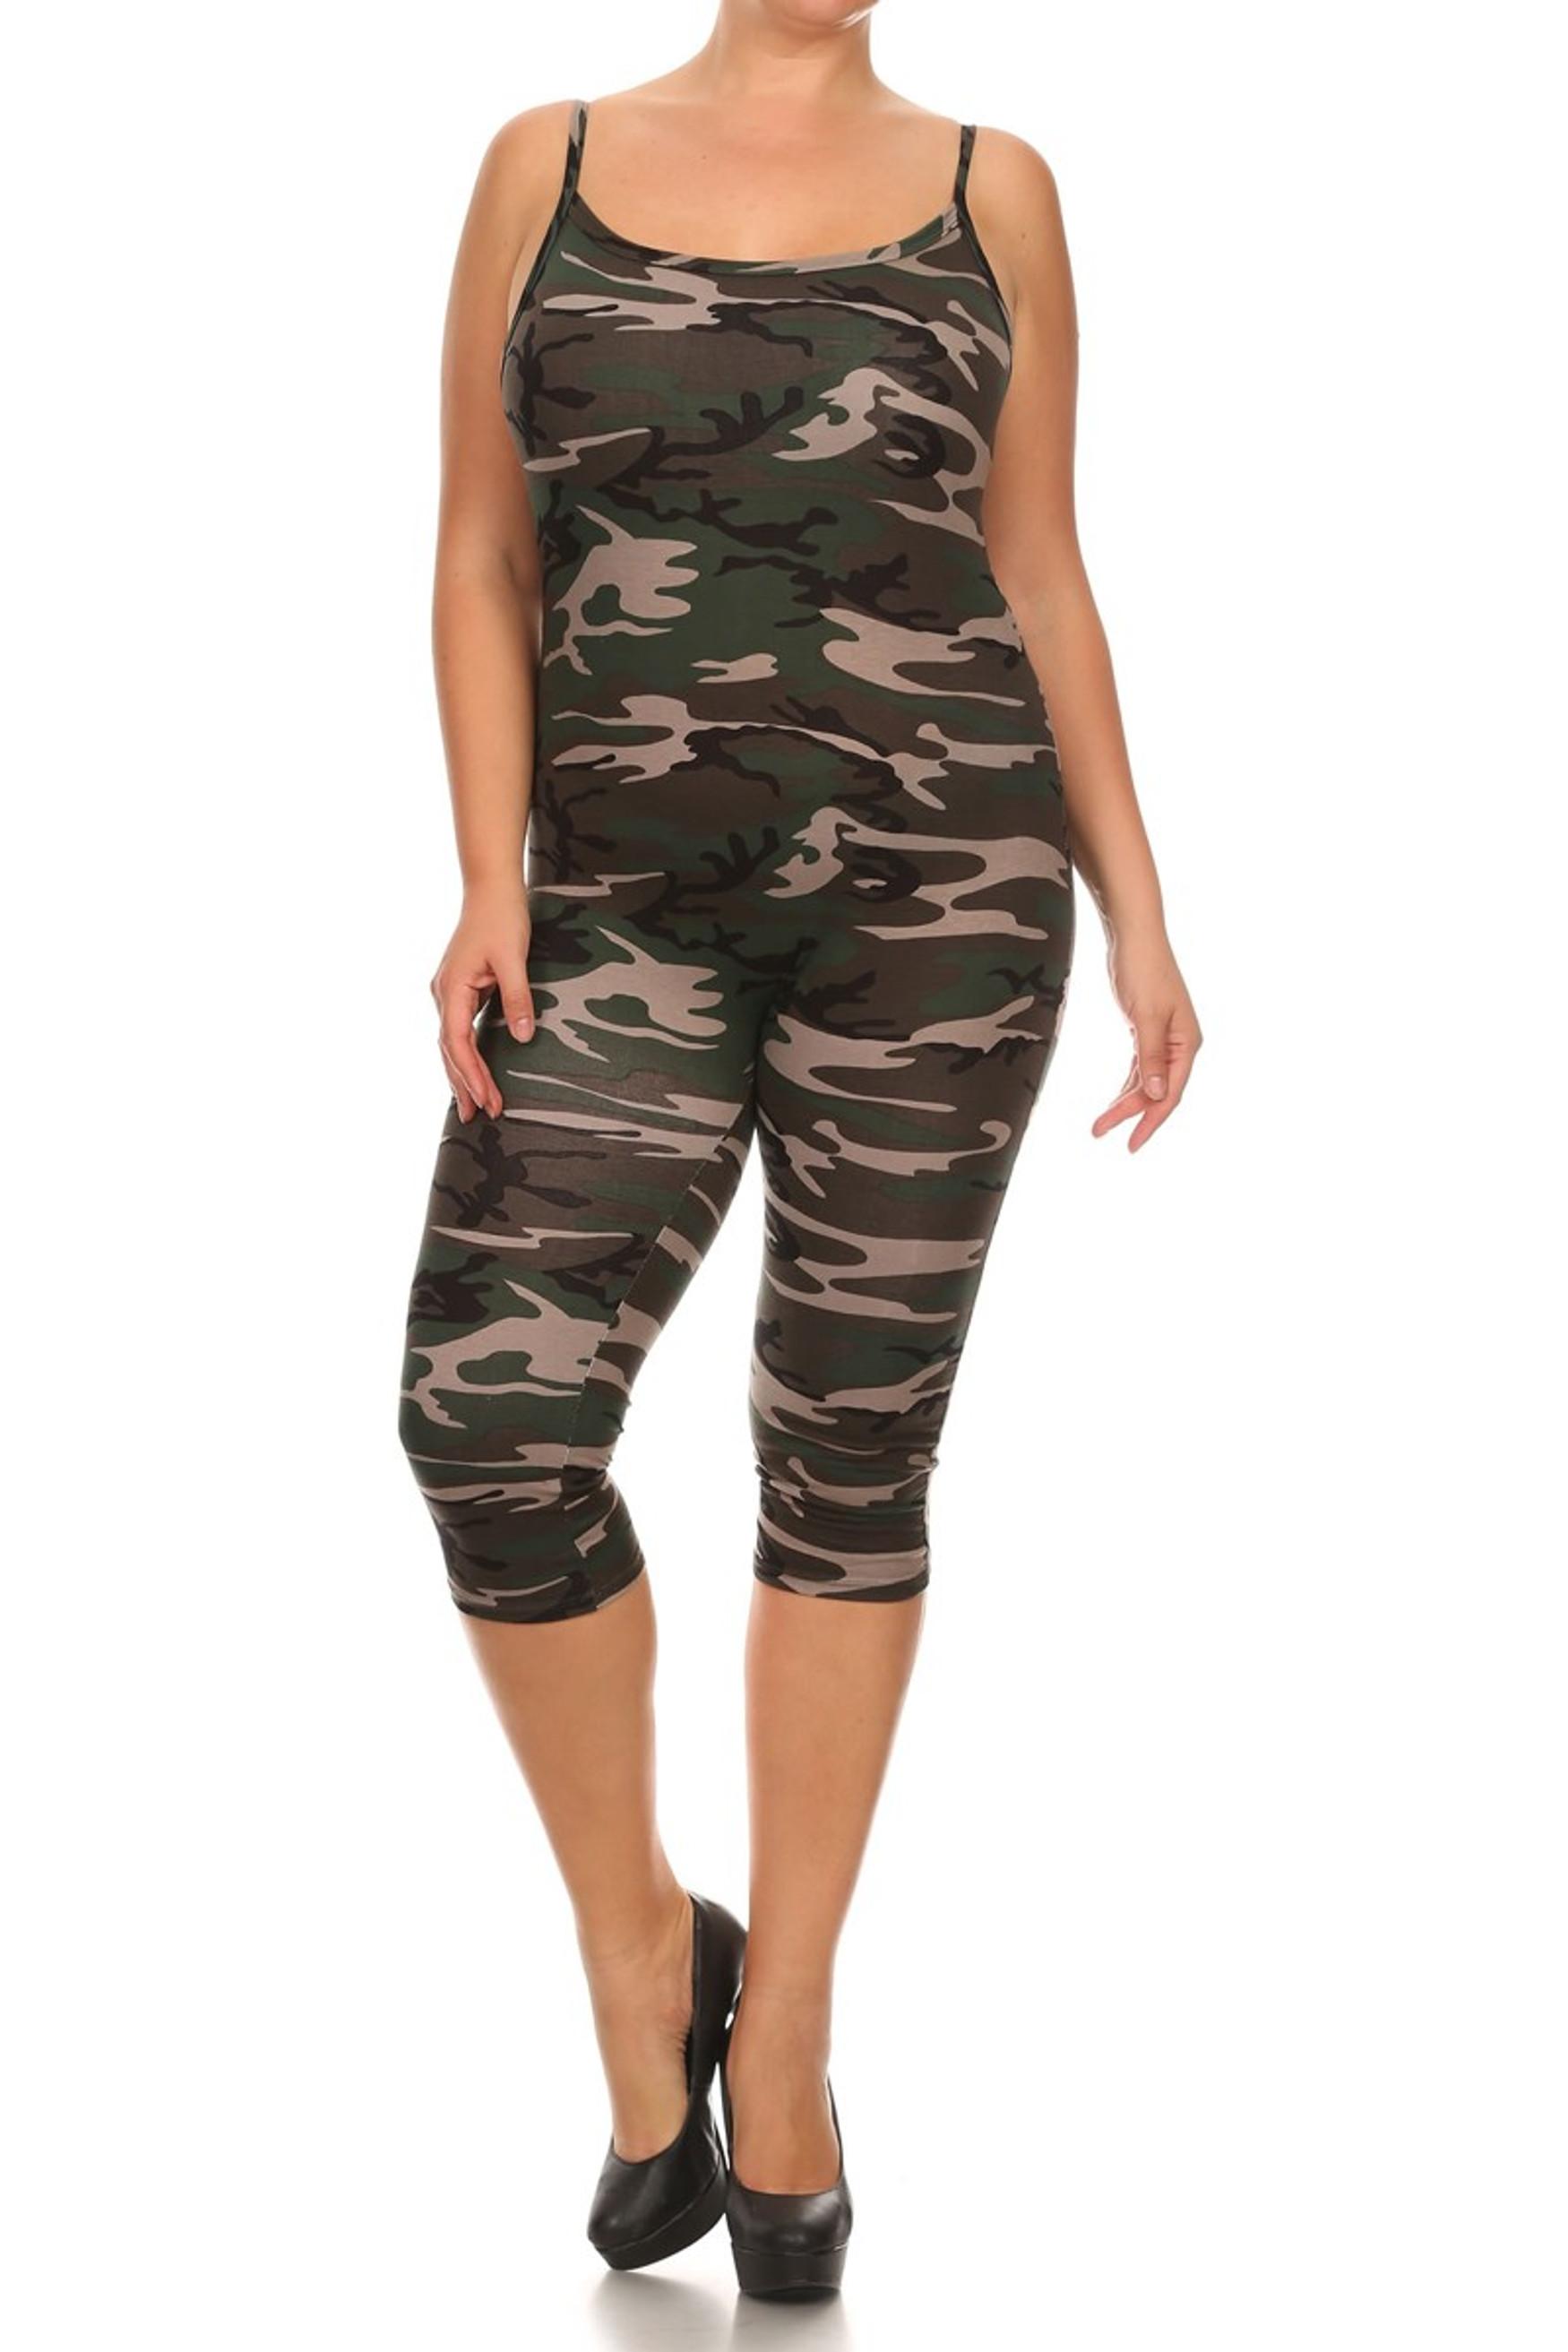 Camouflage Spaghetti Strap Capri Length Jumpsuit - Plus Size